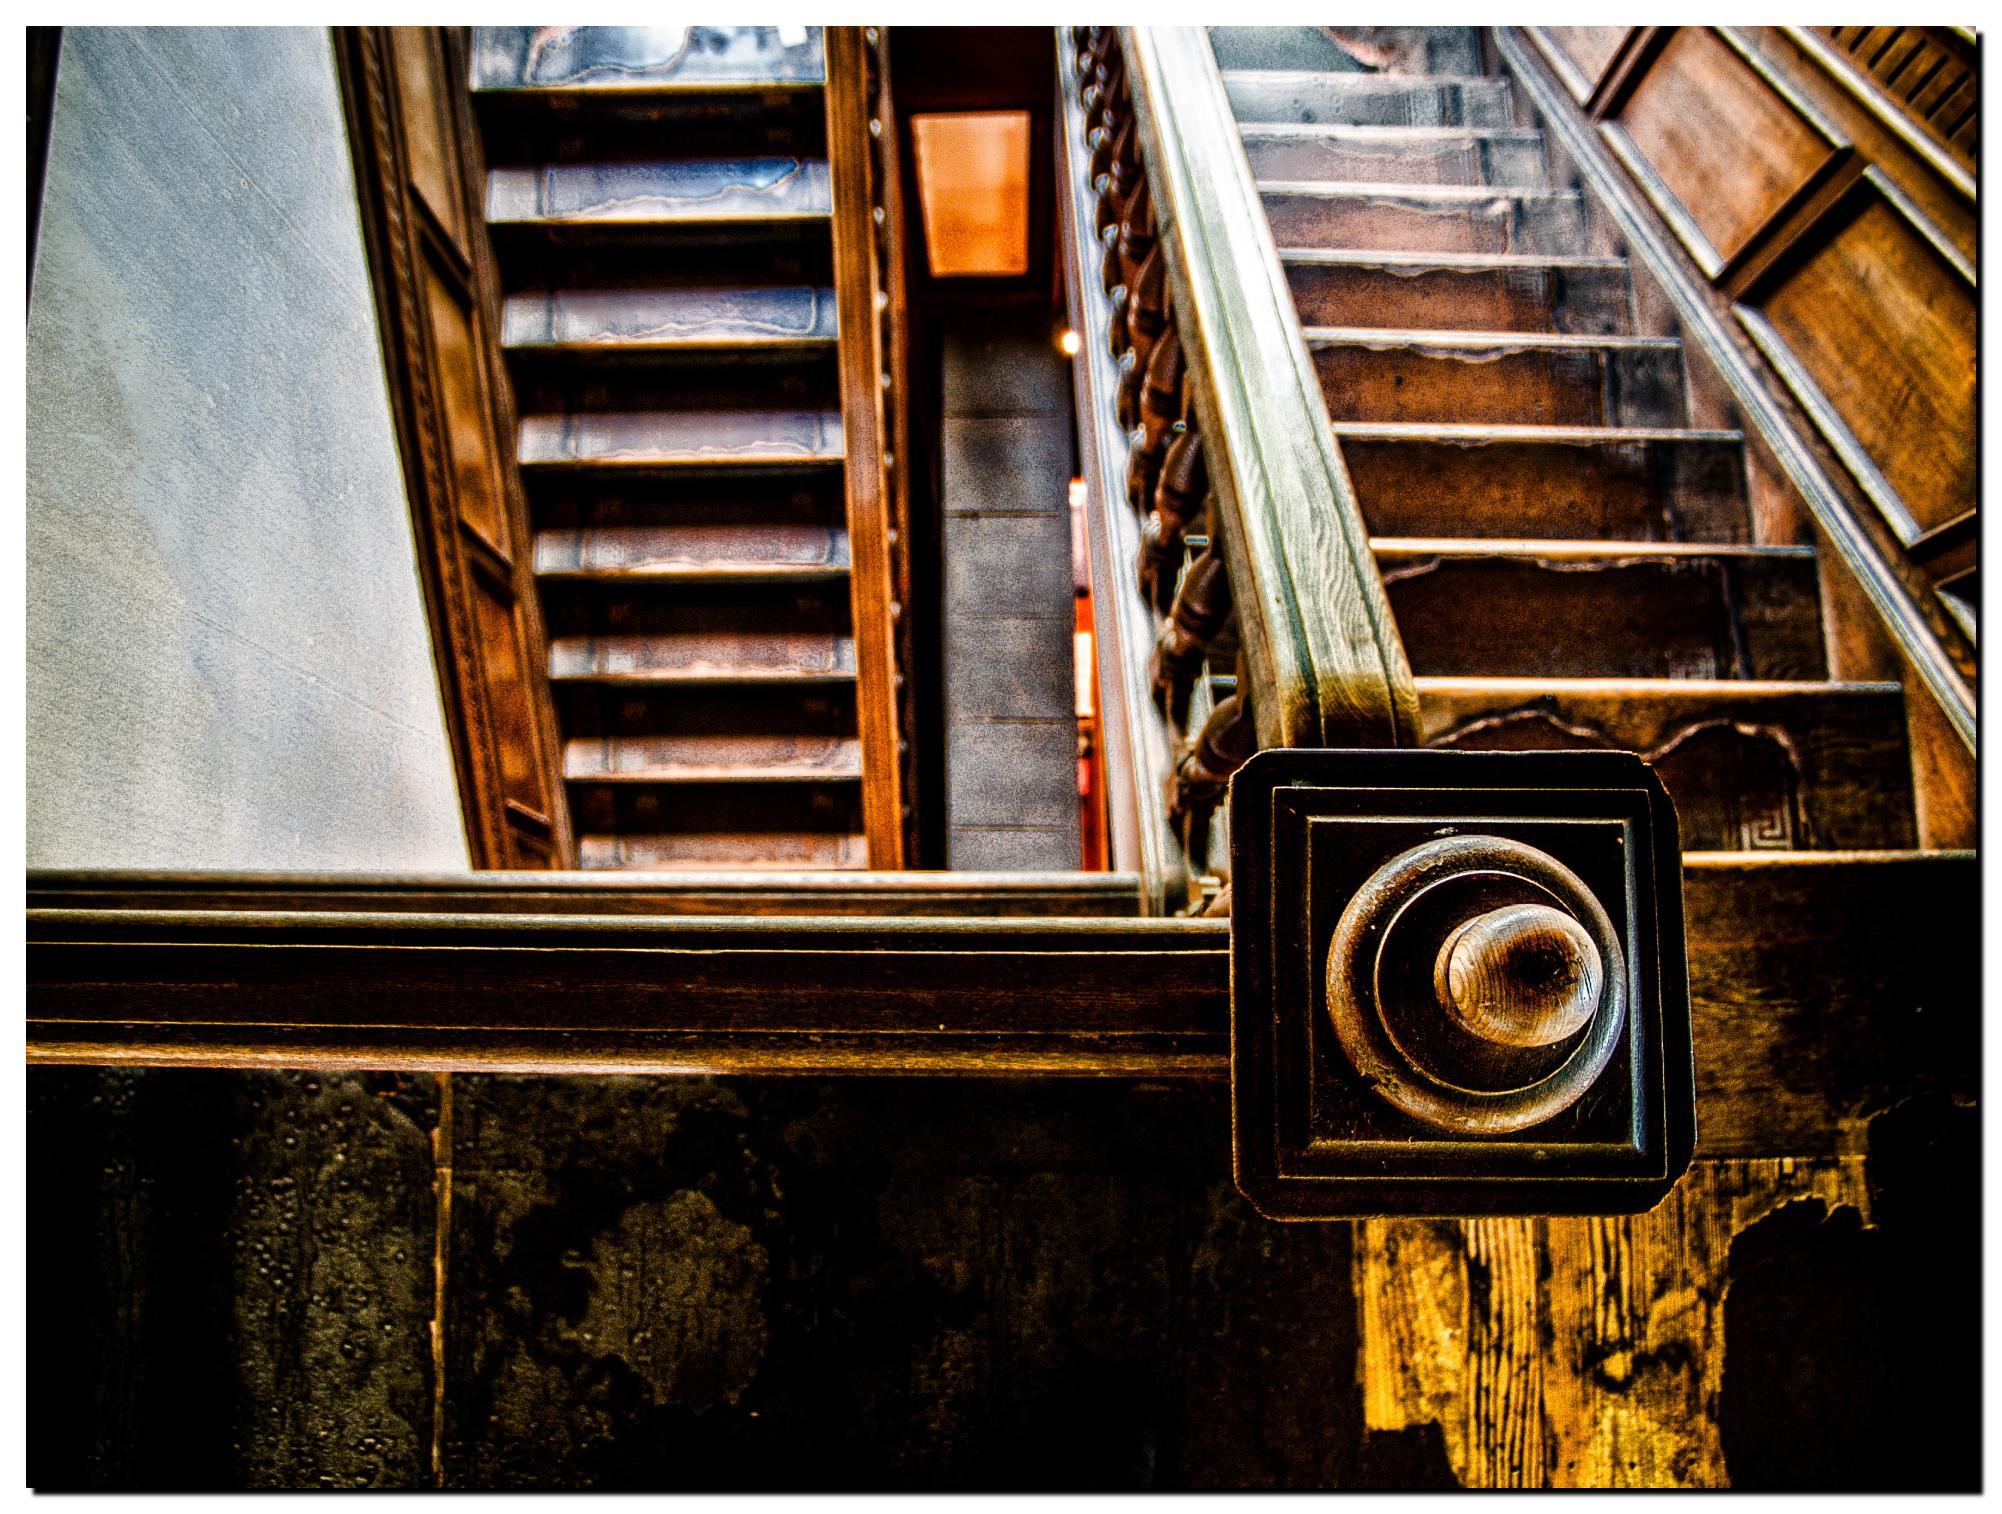 01LR-P9154932-Edit-2-1.jpg